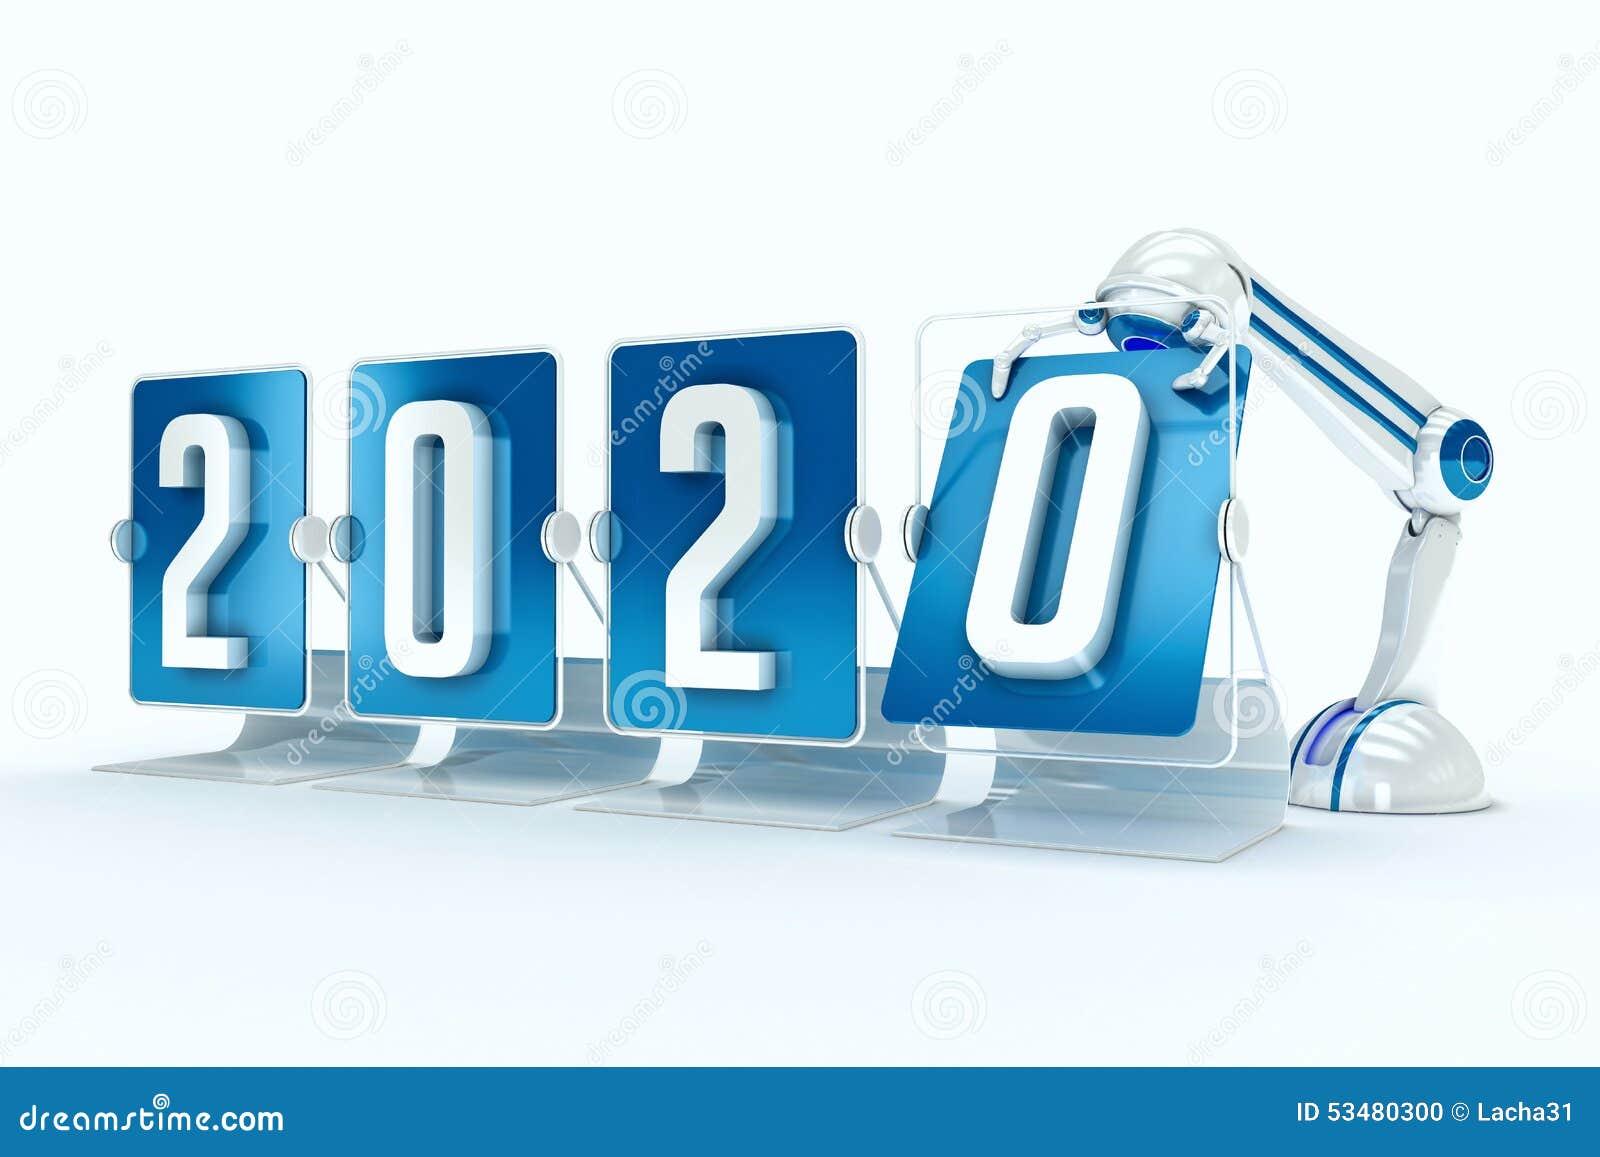 download 2020 design version 9